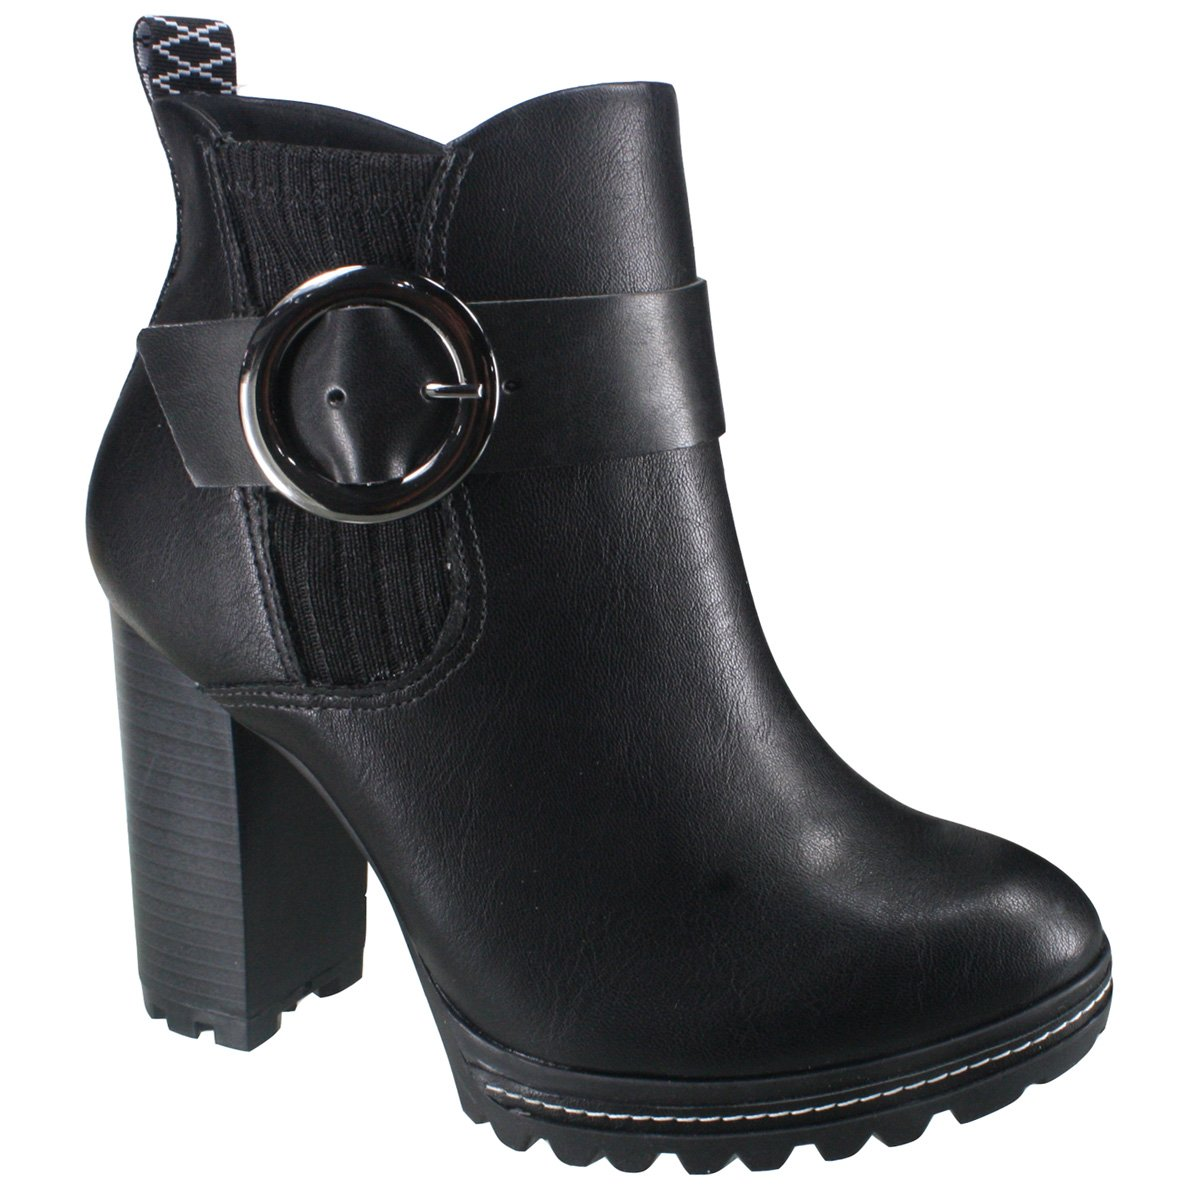 3930644a3 Bota Ankle Boot Ramarim 18-53101 000017 - Preto (Naturale Plus ...